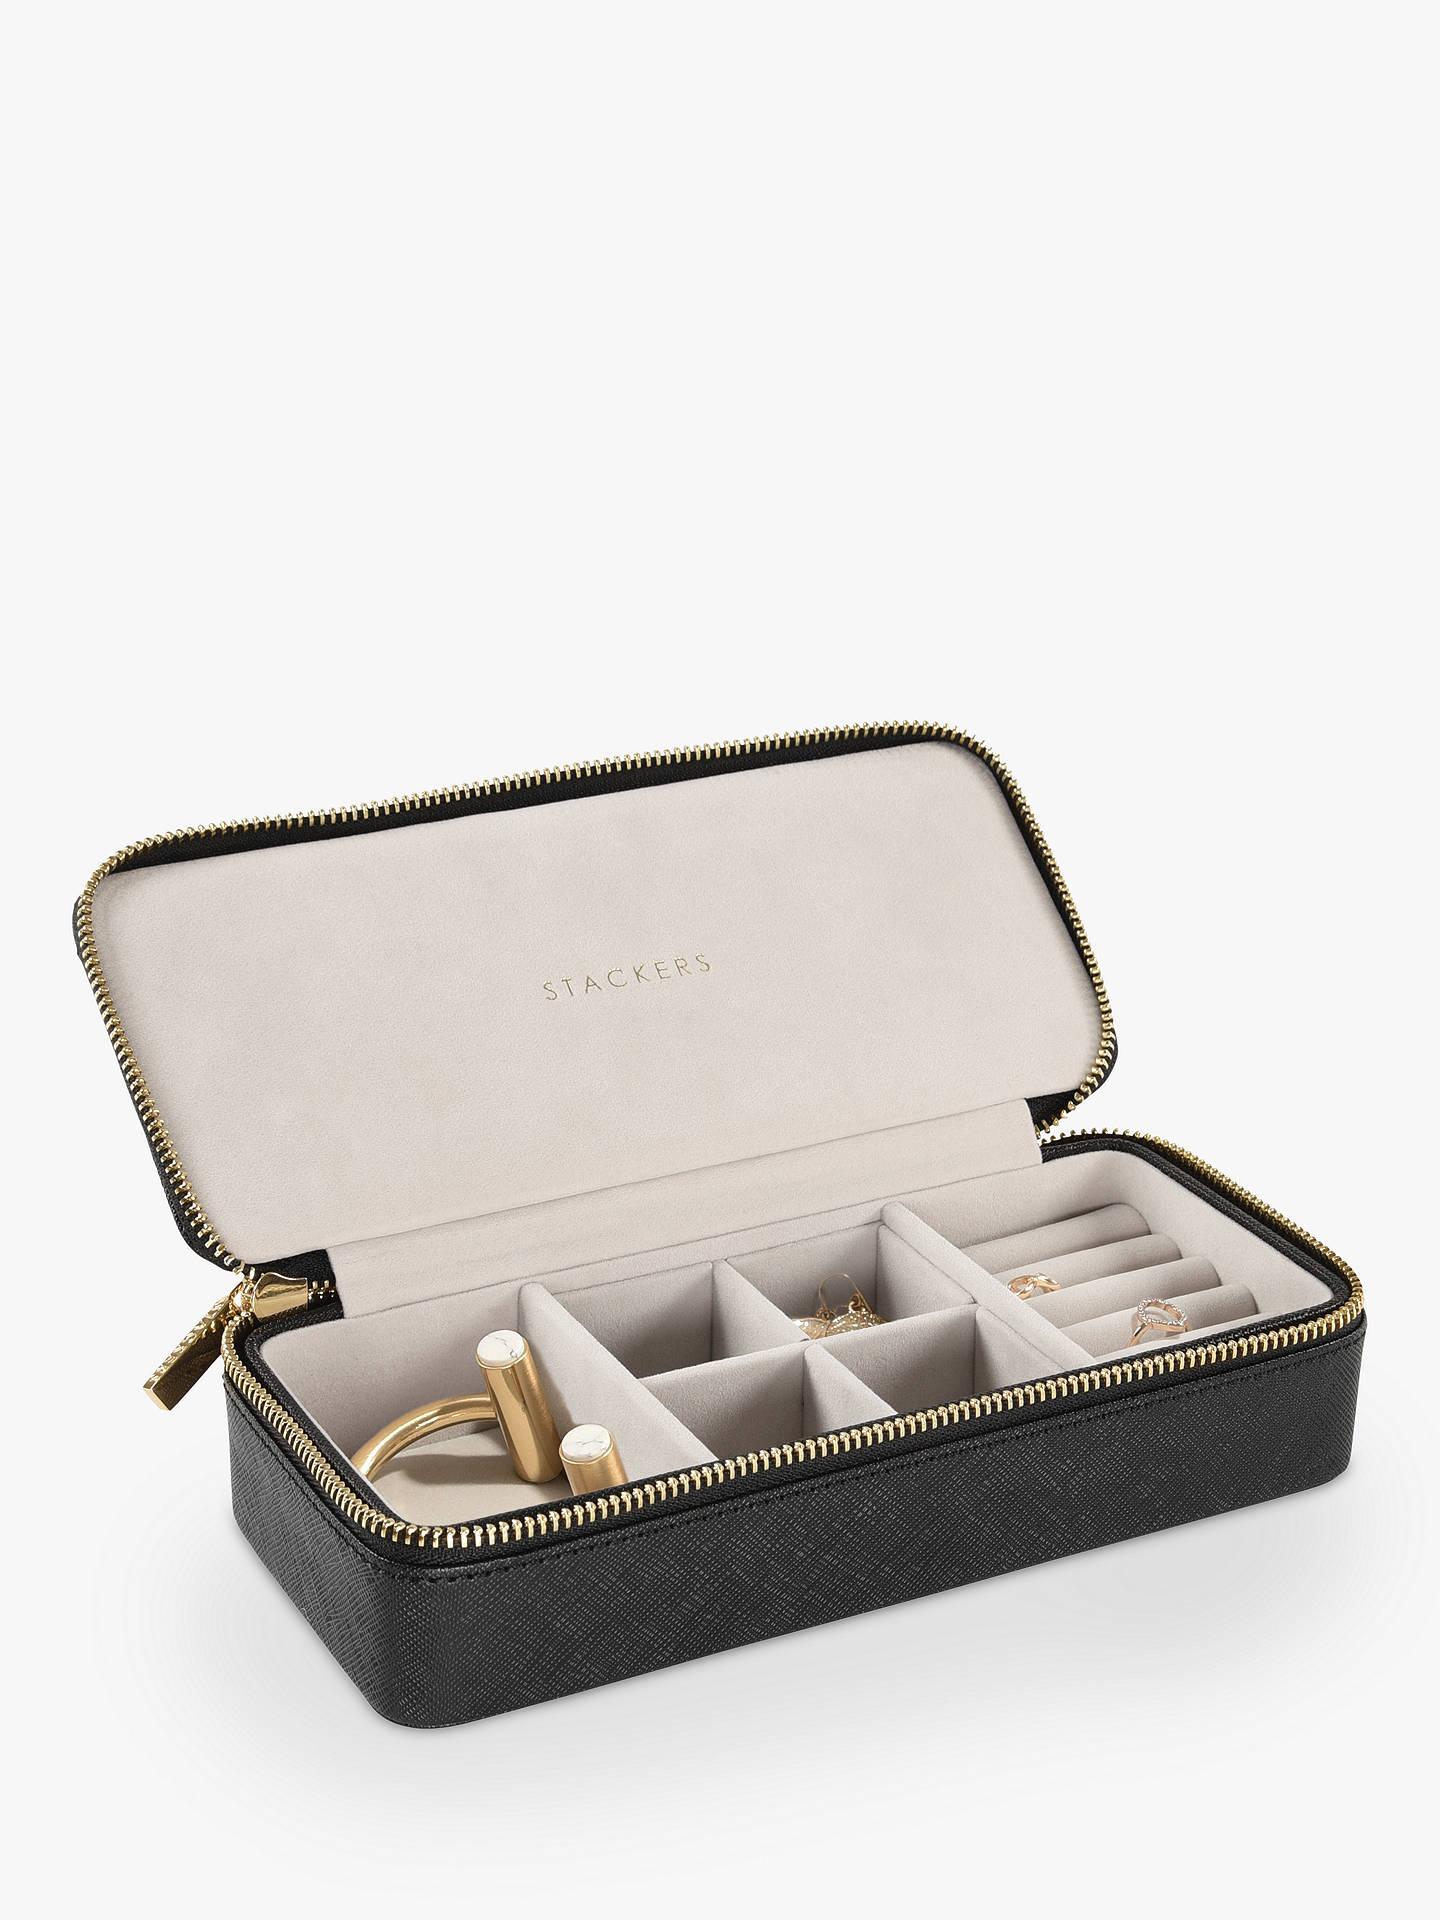 Stackers Weekend Travel Jewellery Box Black